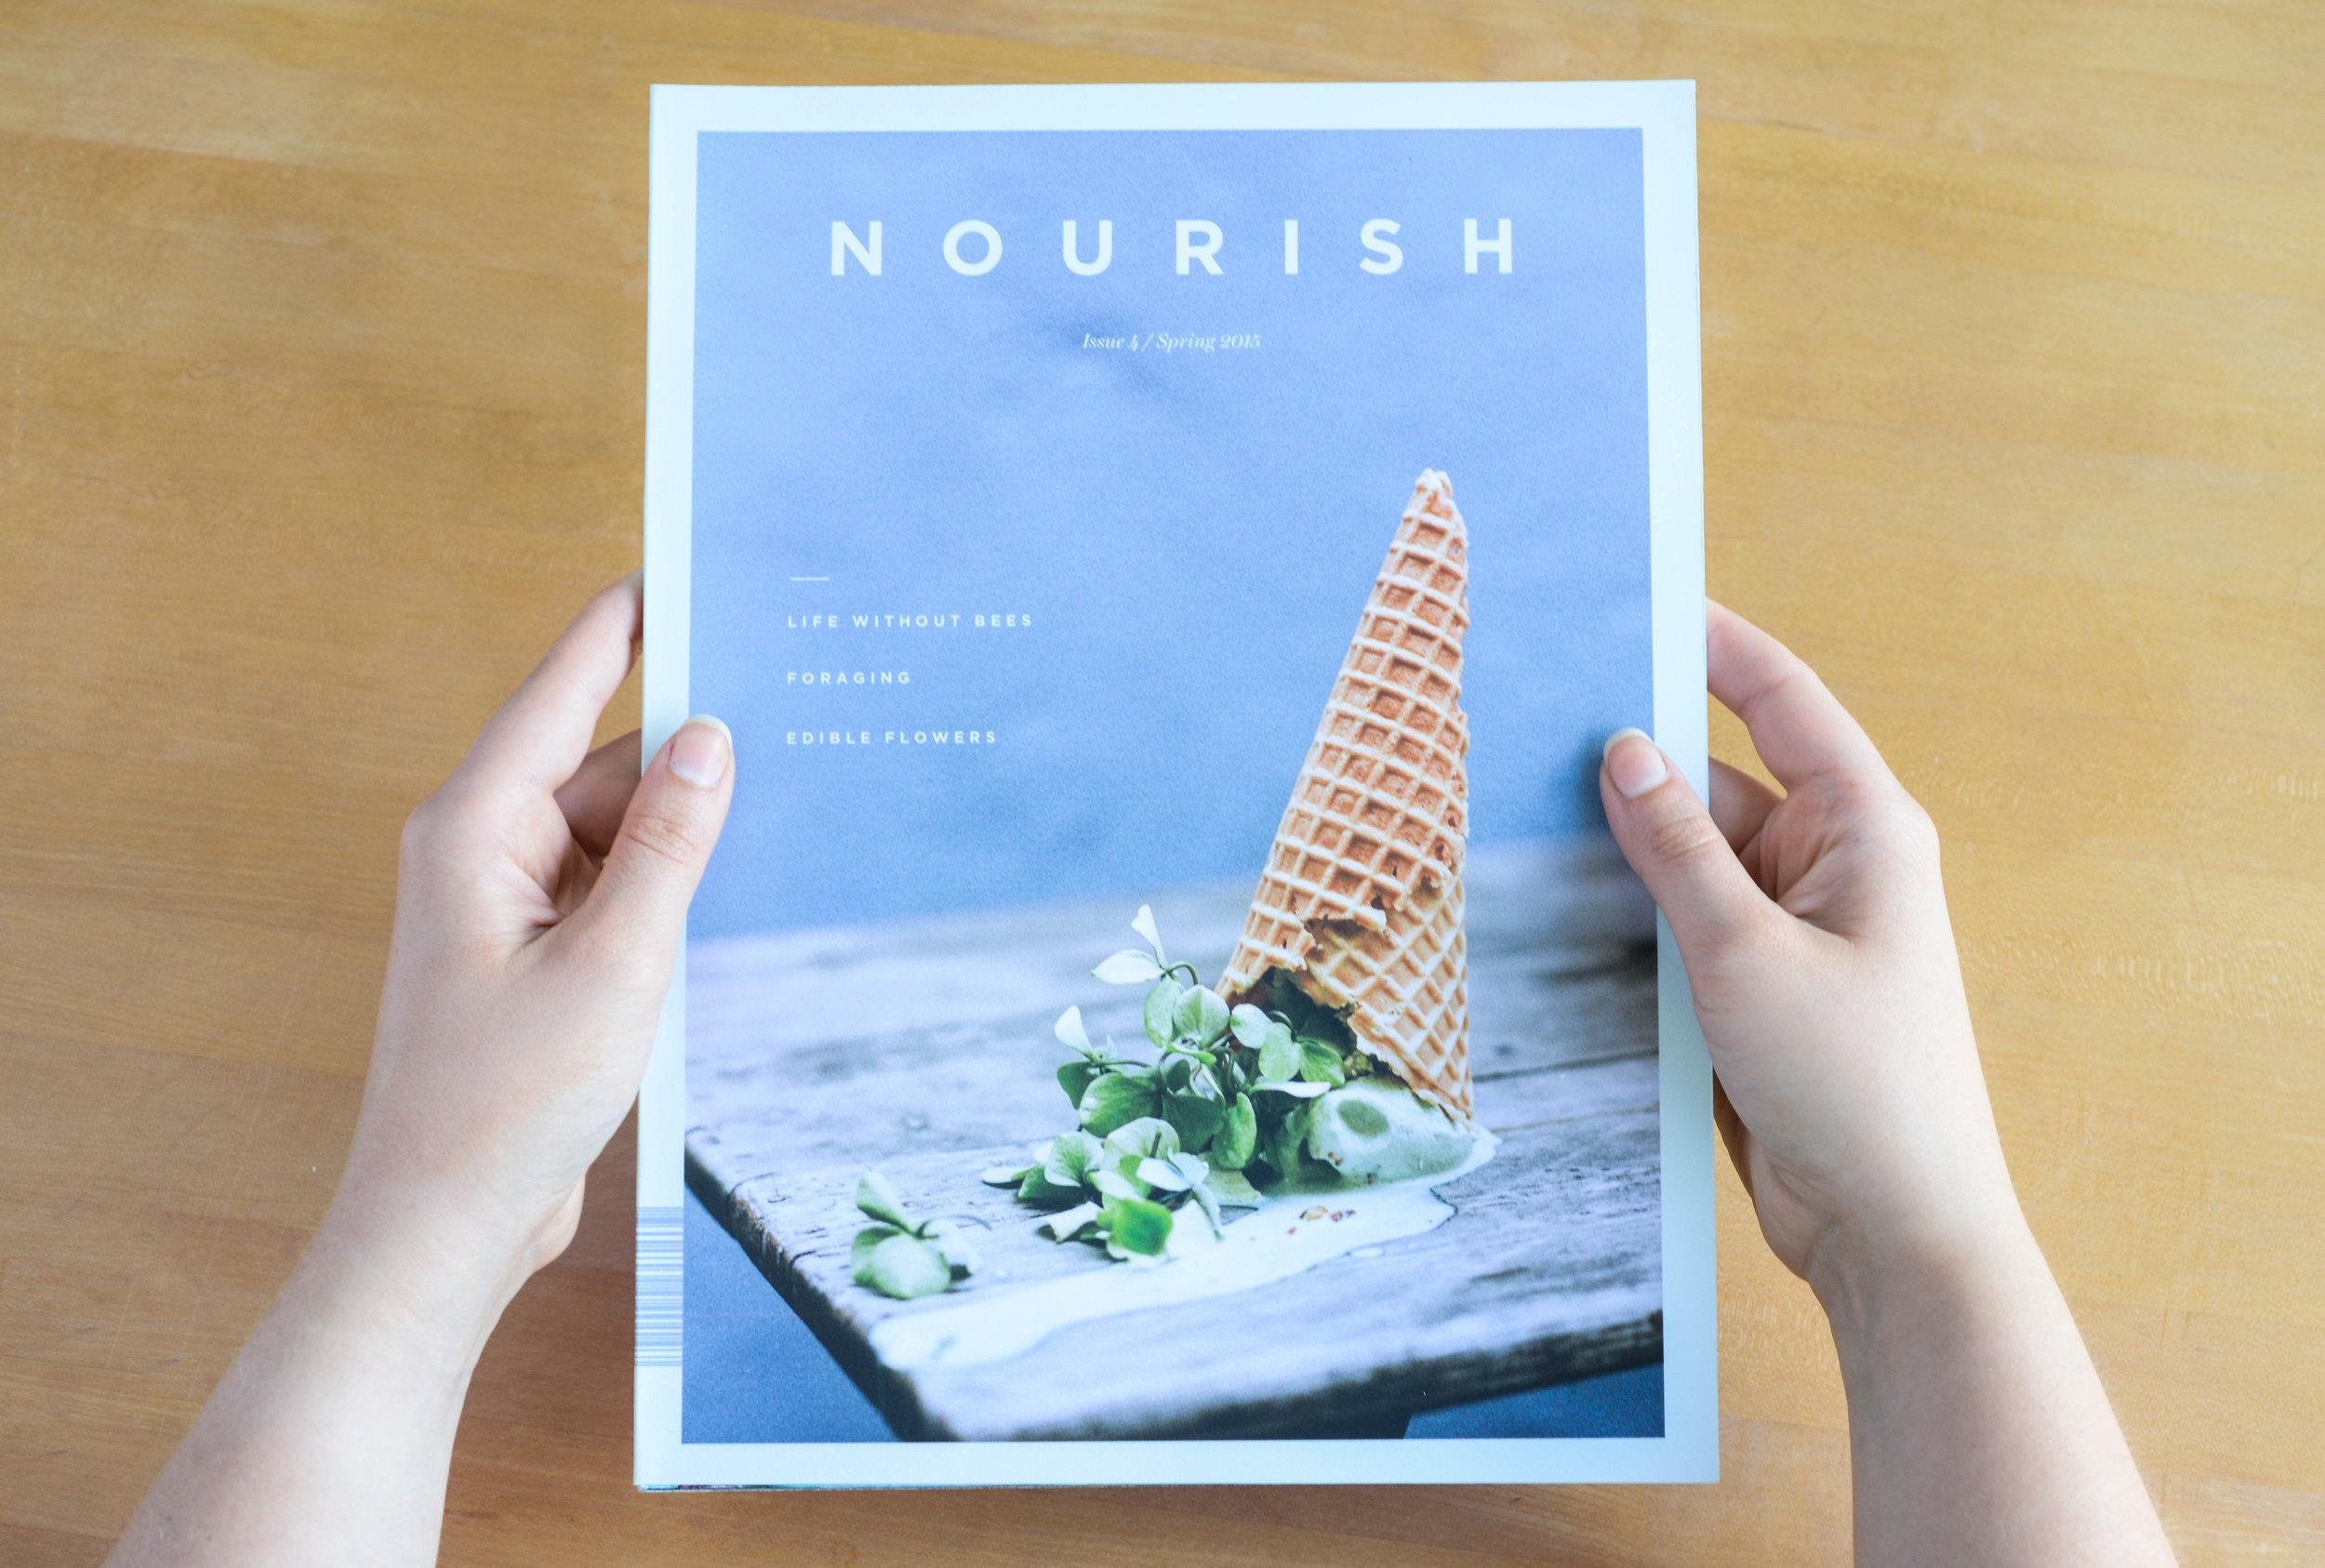 nourish edit.jpg